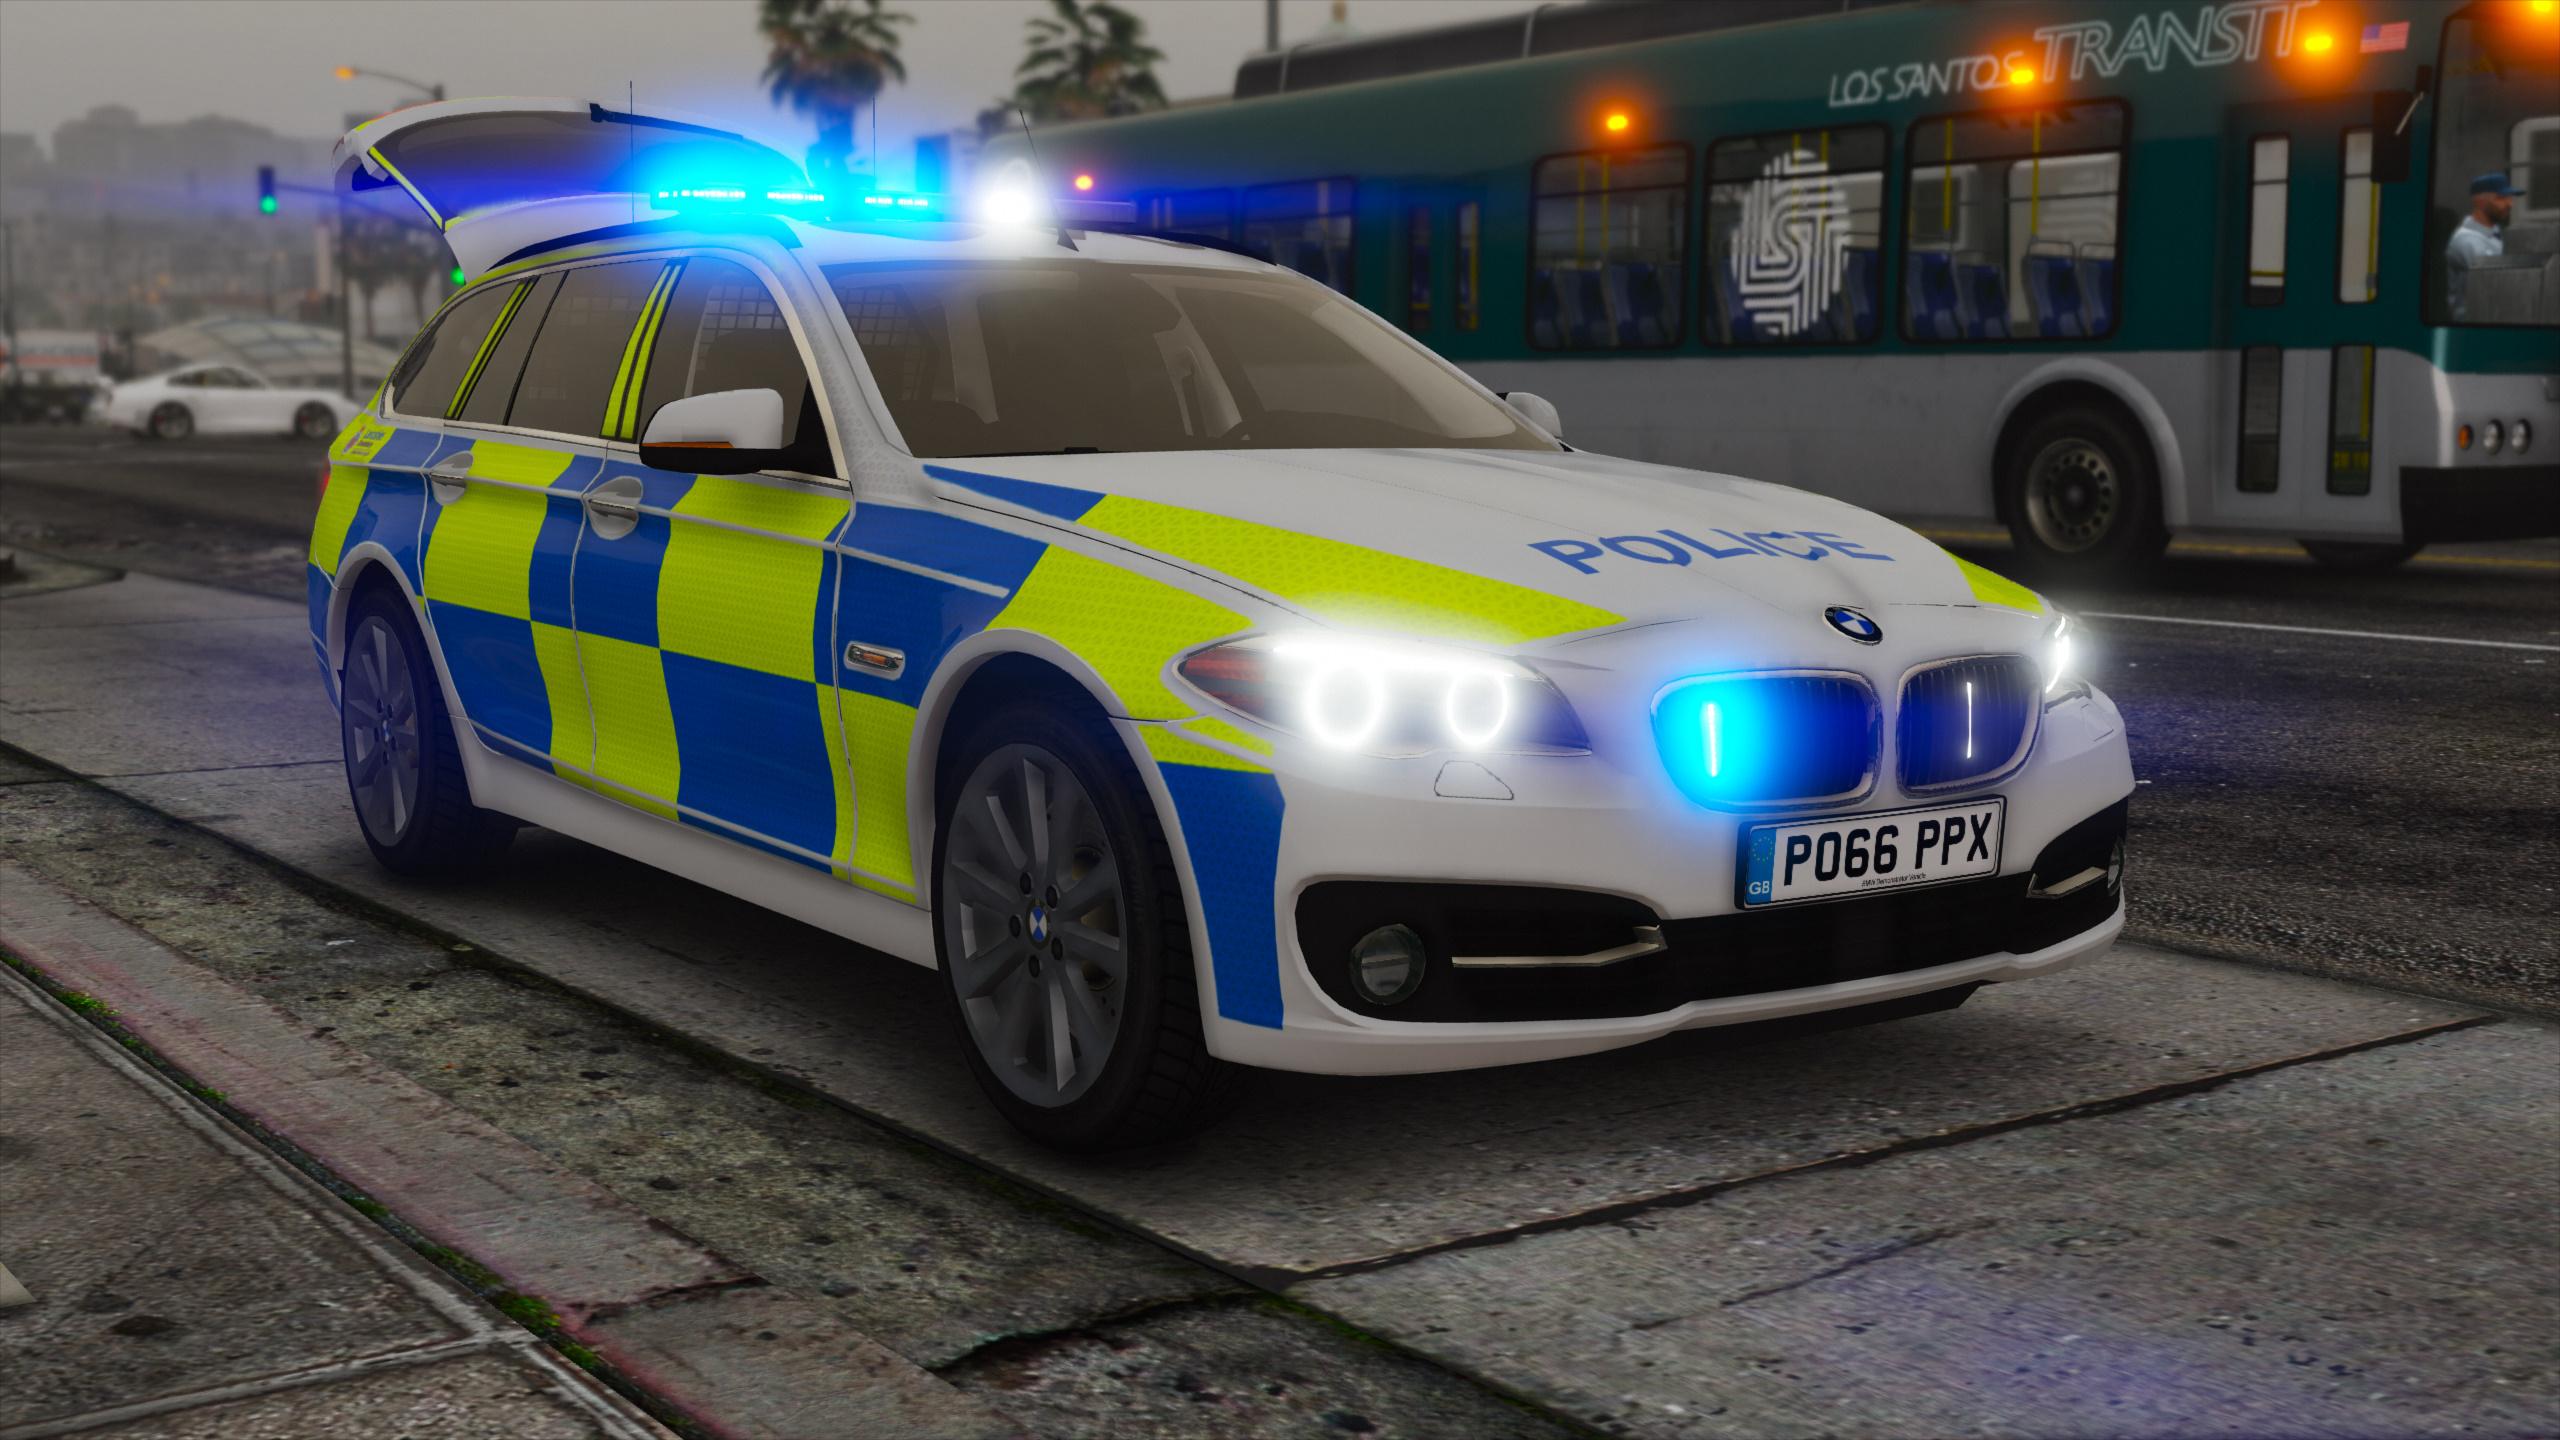 lancashire police bmw 530d touring replace els gta5. Black Bedroom Furniture Sets. Home Design Ideas